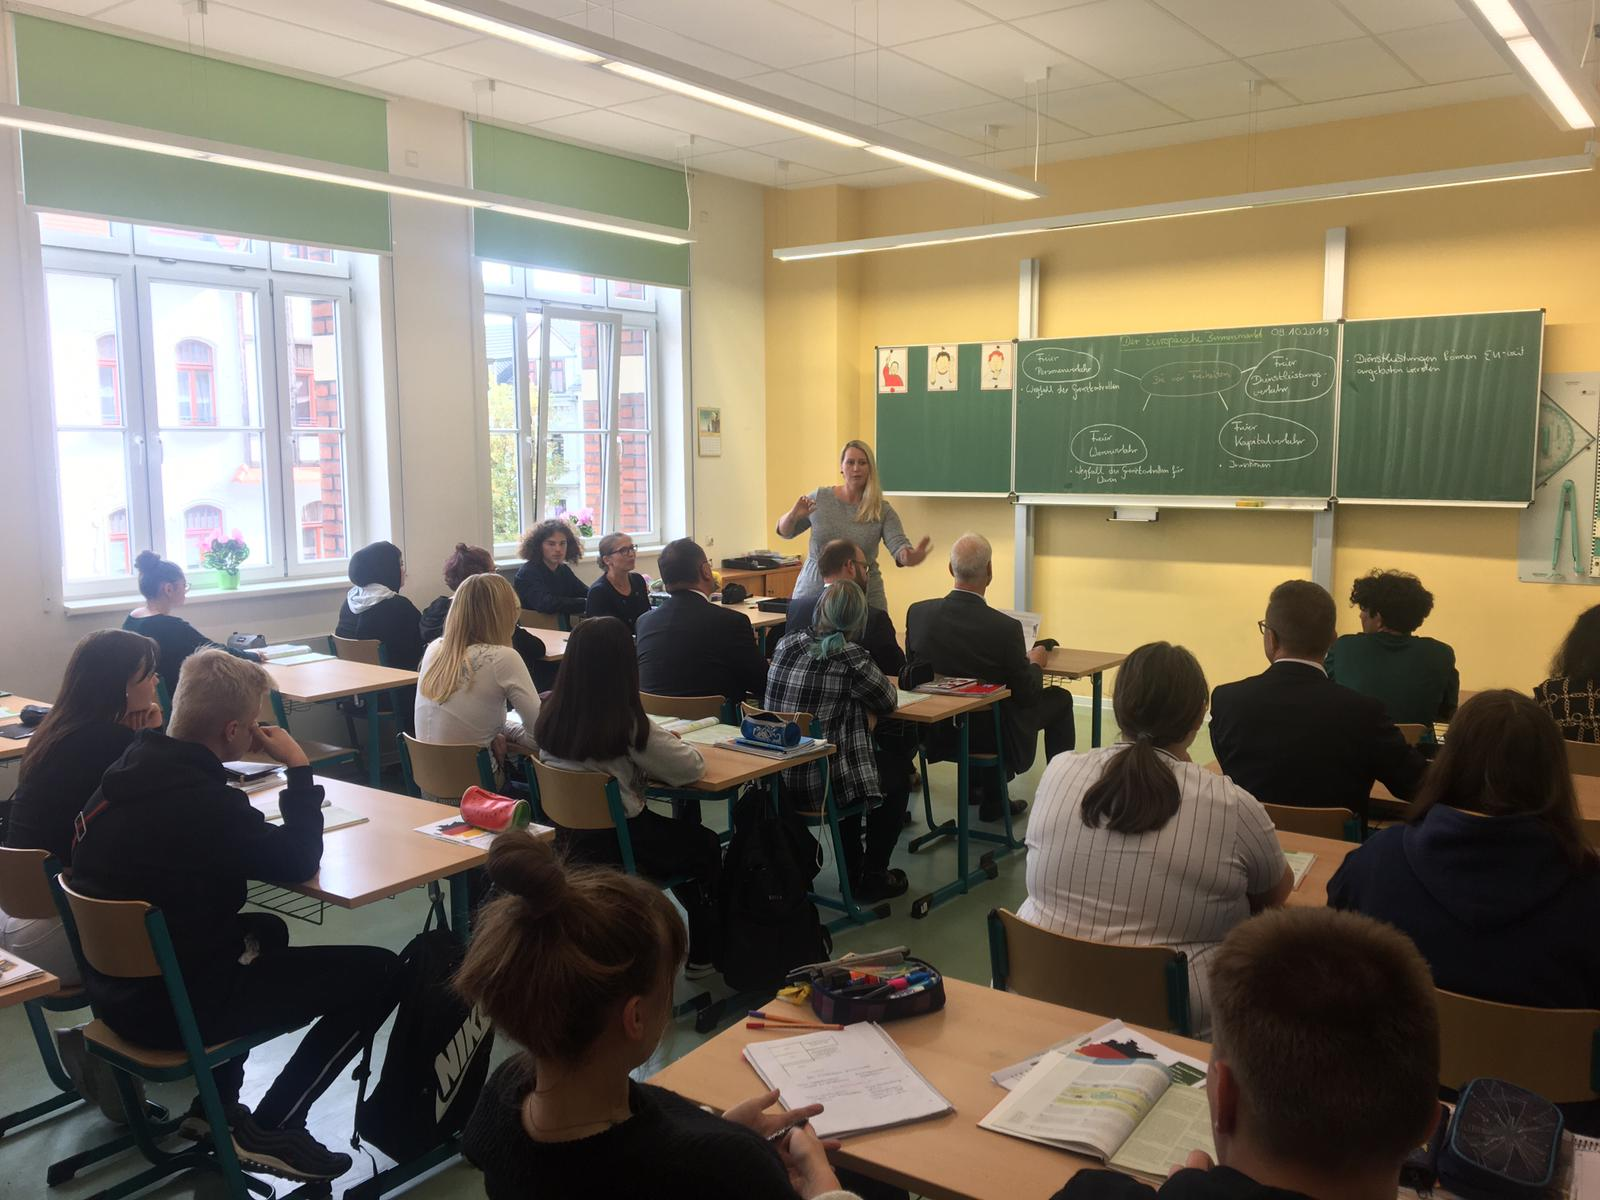 68.Oberschule Leipzig